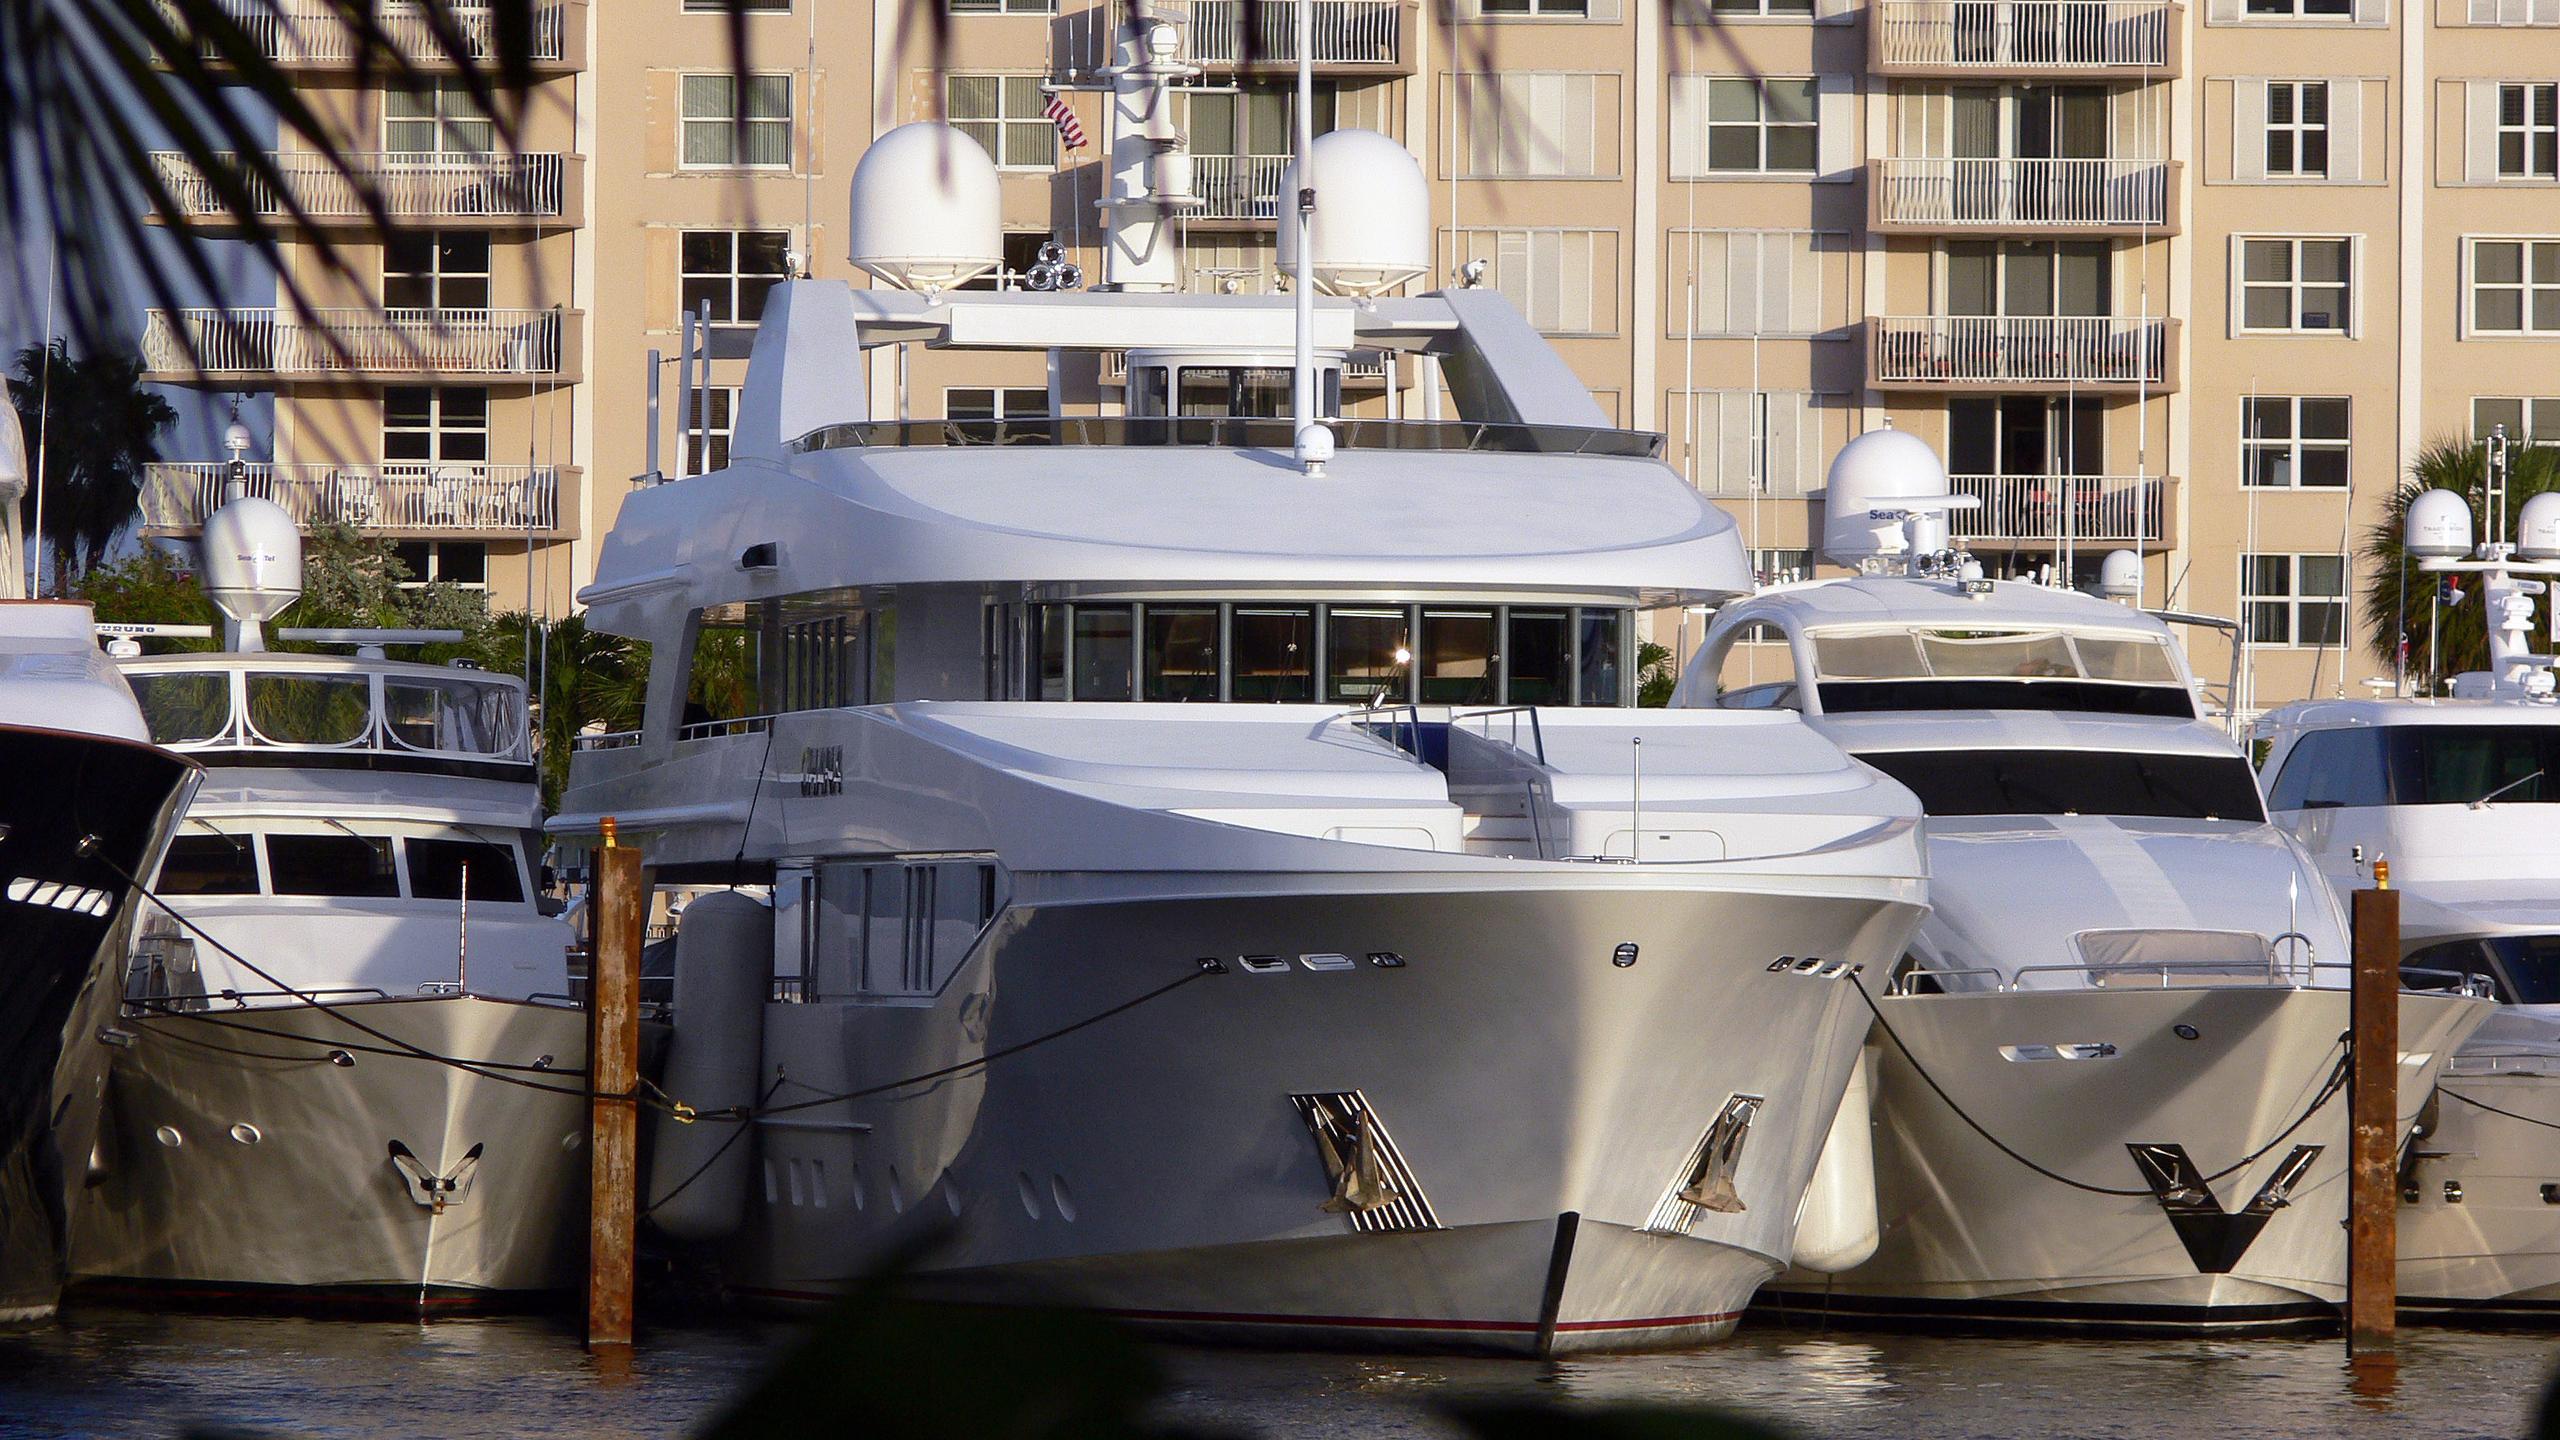 rhino-motor-yacht-admiral-marine-1998-47m-moored-bow